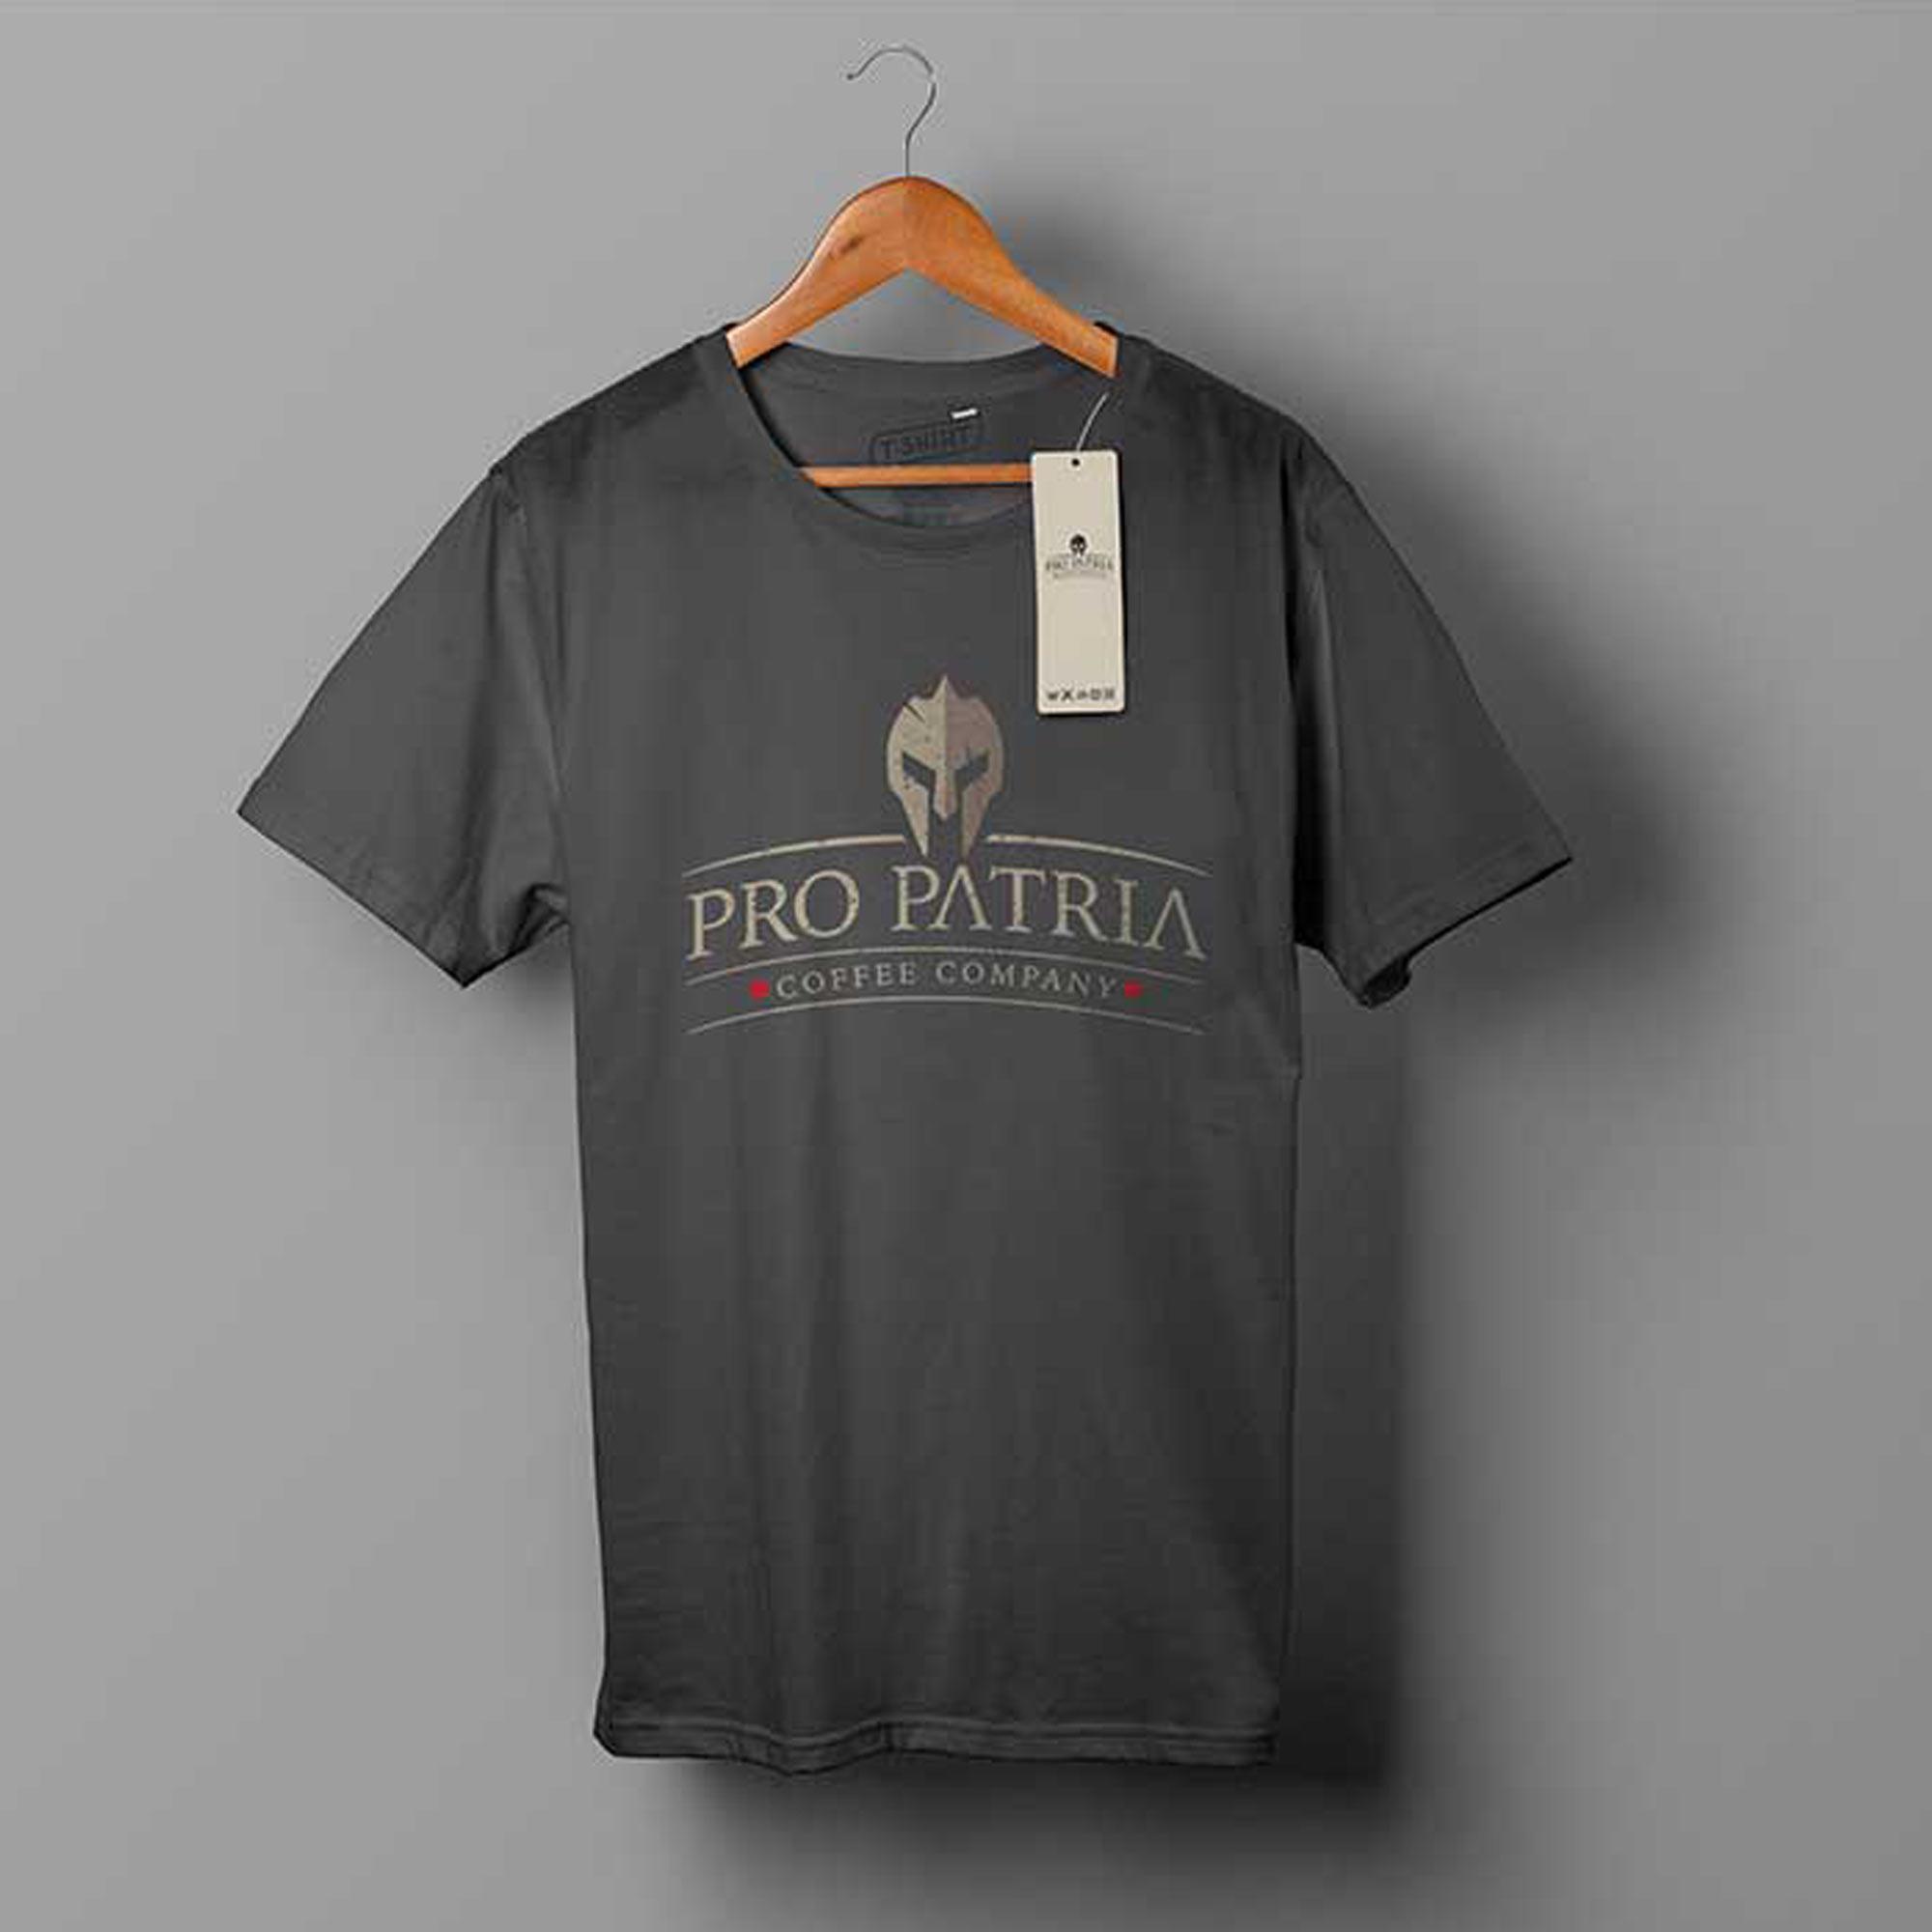 Pro Patria T-Shirts